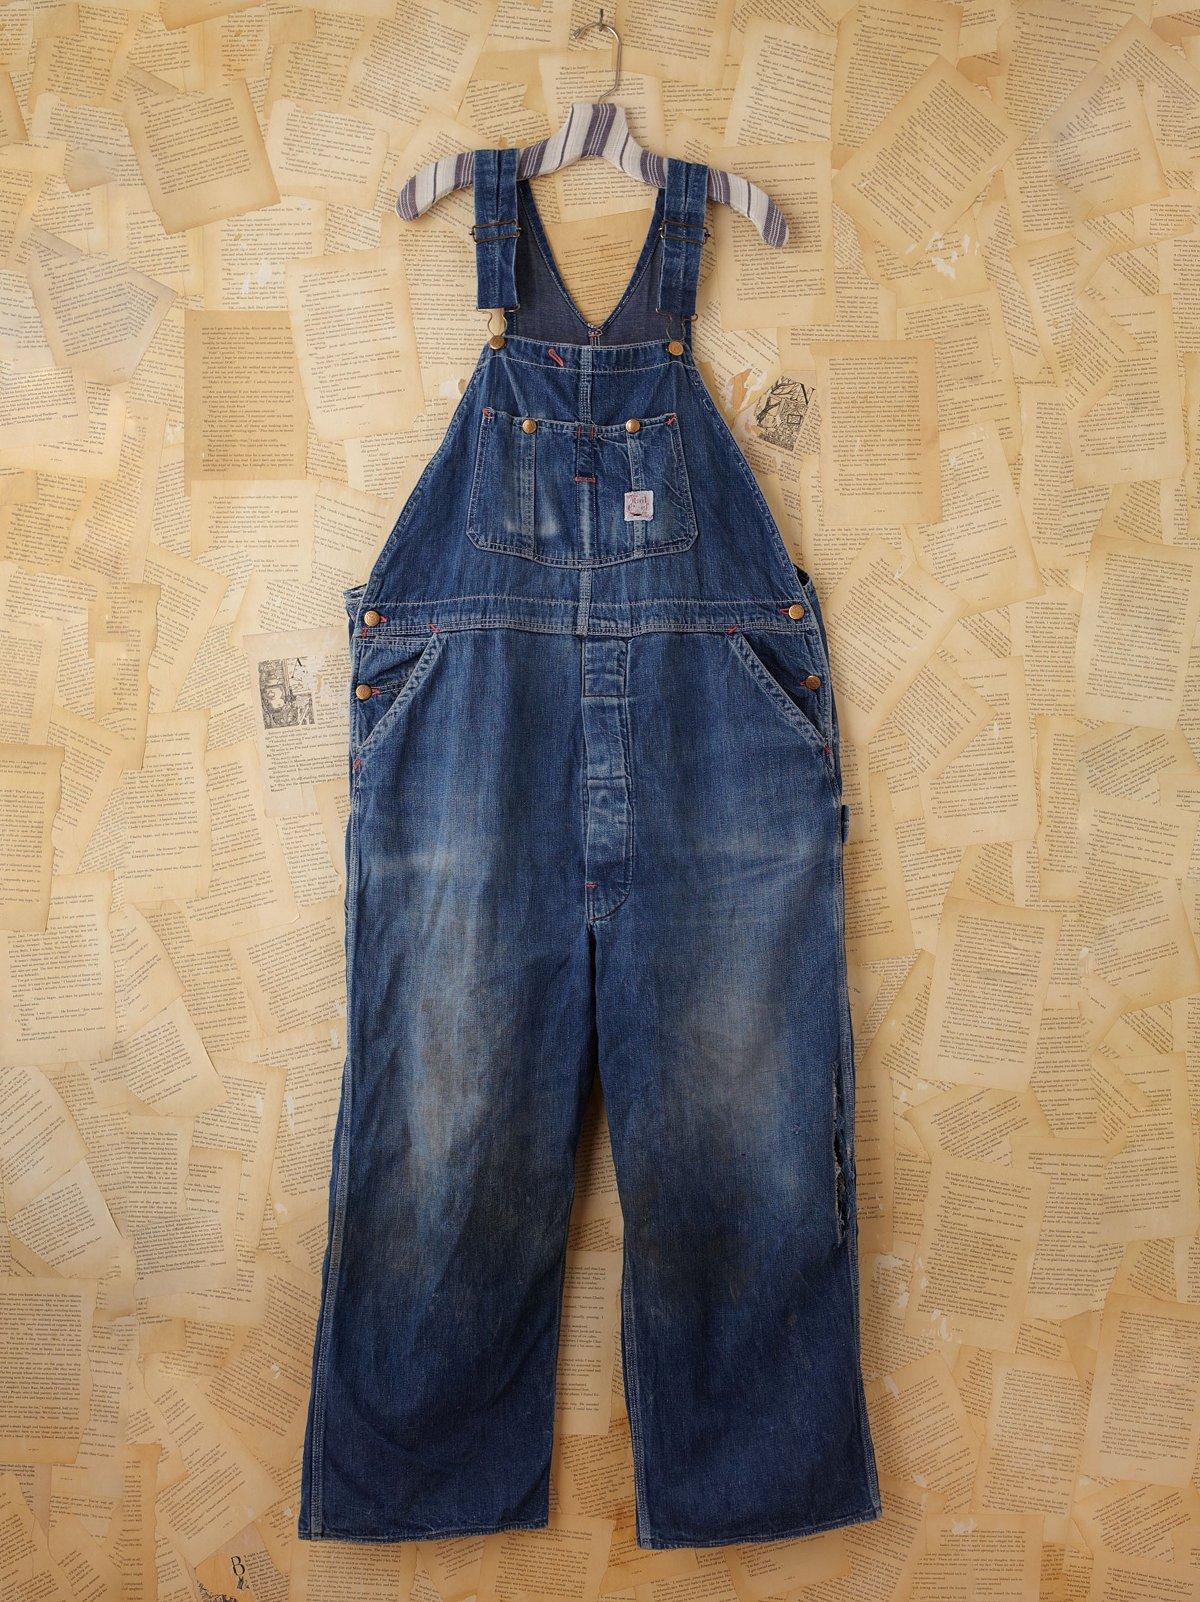 Vintage Distressed Denim Overalls